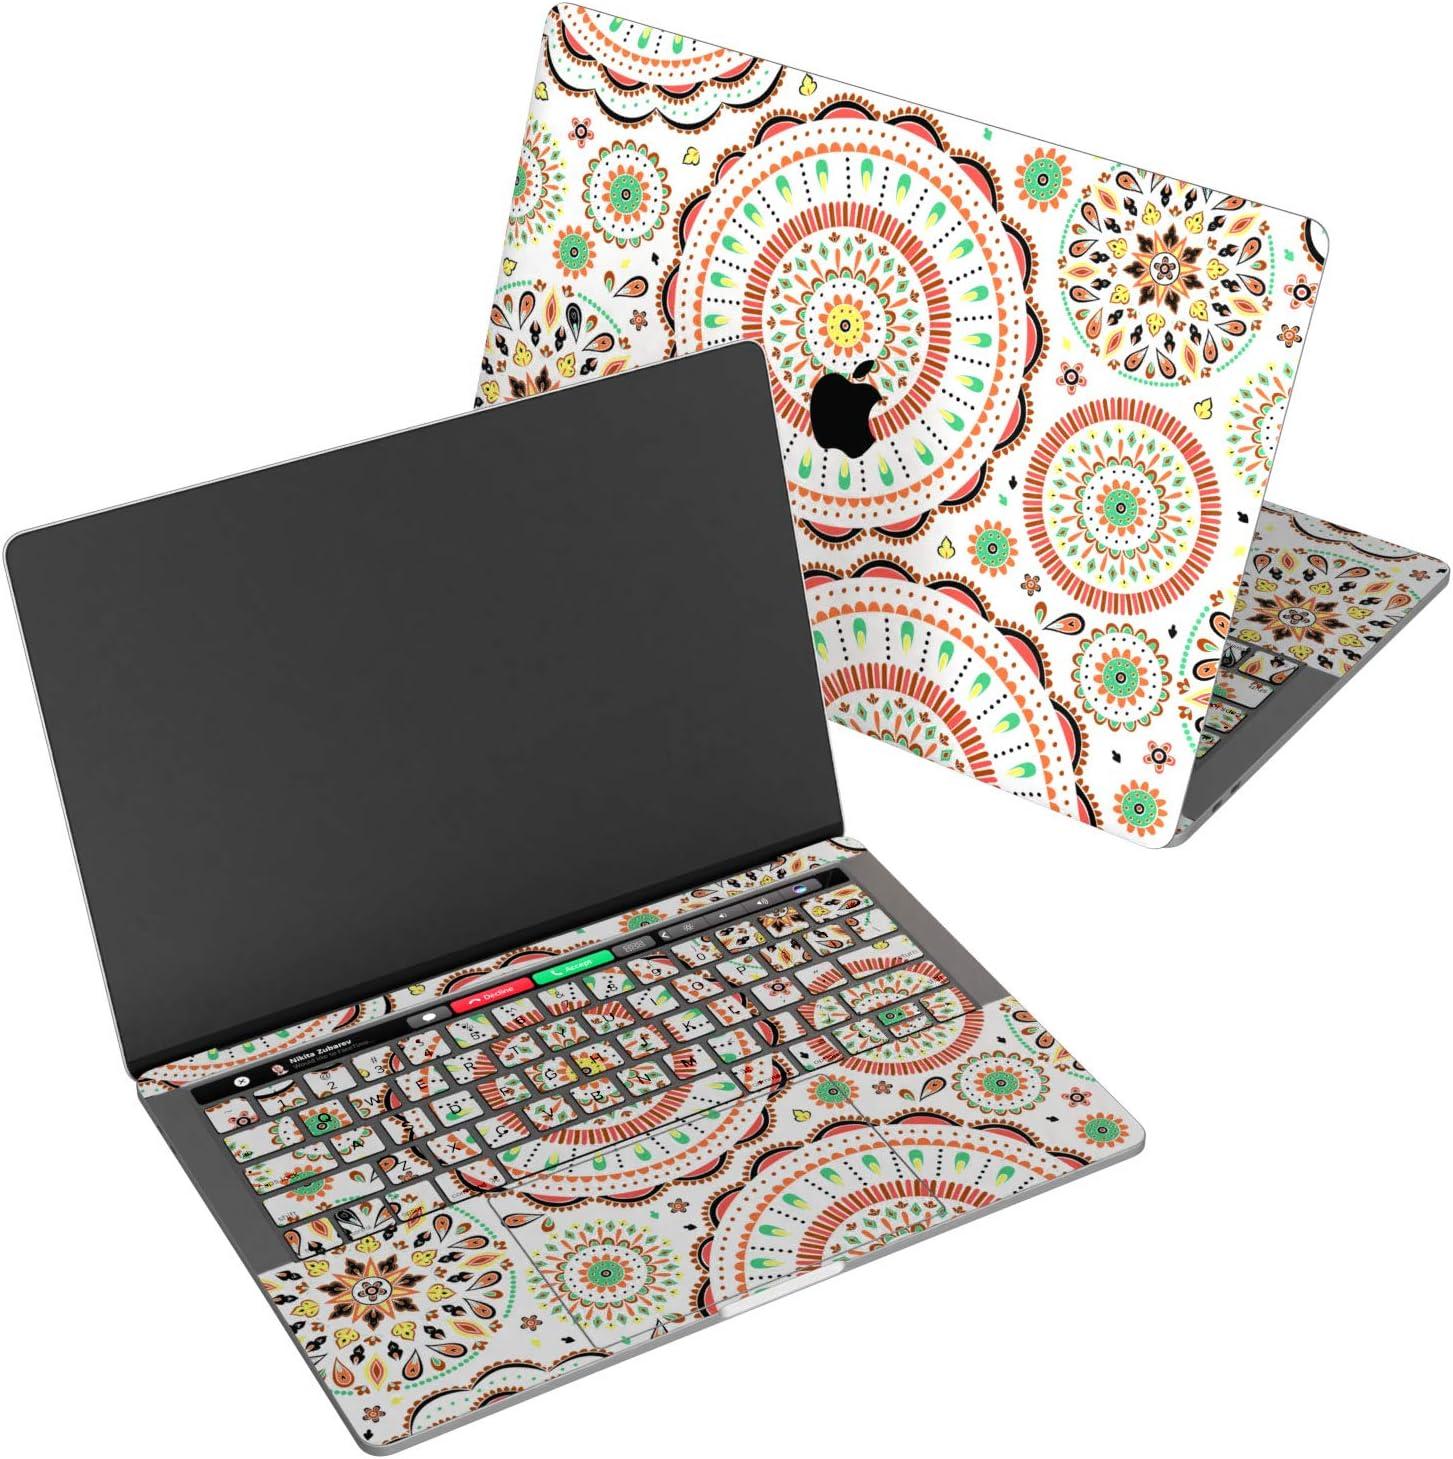 "Wonder Wild Skin for MacBook Decal Vinyl Air 11 inch Apple Mac 13 Retina 12 Pro 15 Keyboard 2019 2018 2017 2016 16"" Protective Sticker Laptop Mandala Ornament Pattern Colored Circle Kaleidoscope"